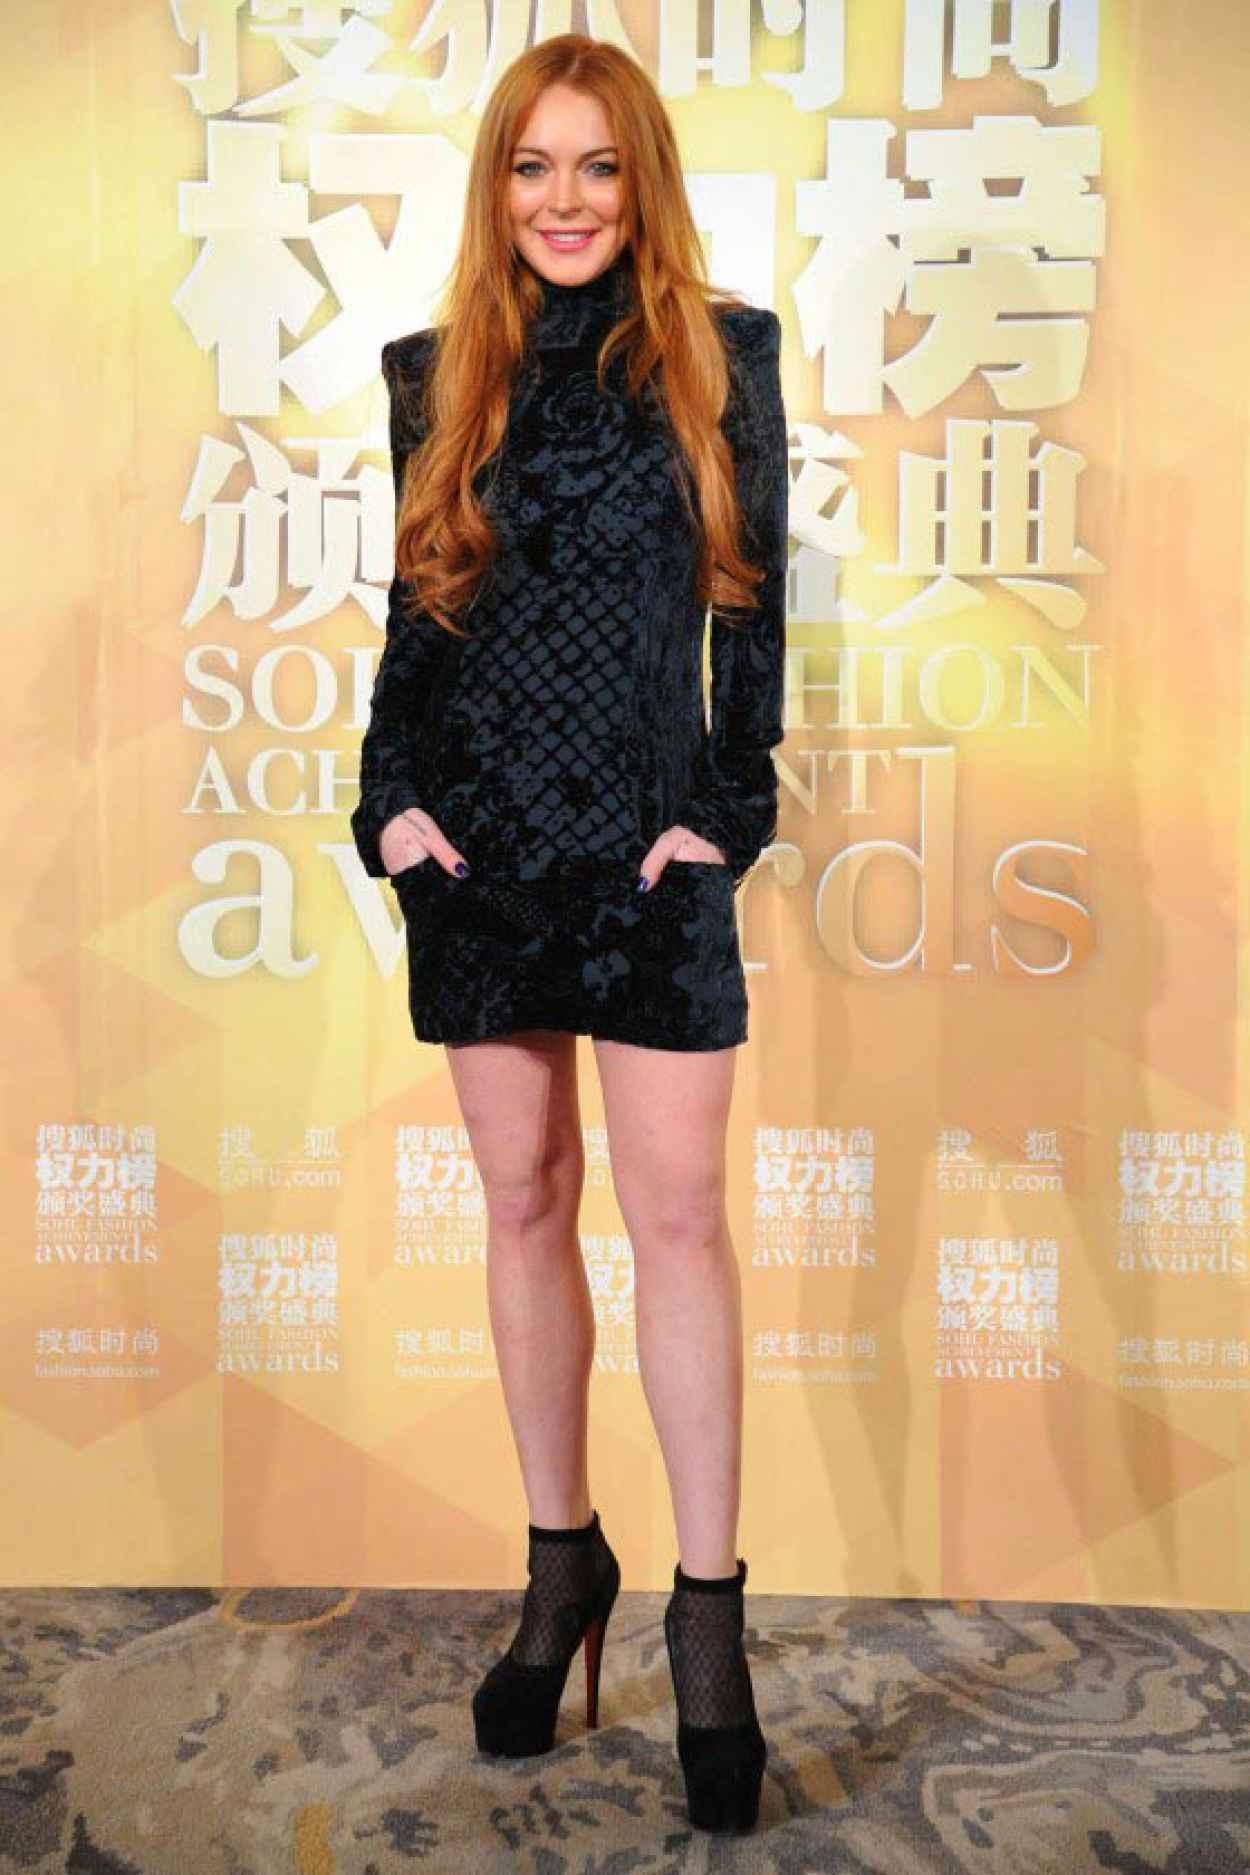 Lindsay Lohan Leggy at Sohu Fashion Awards-1